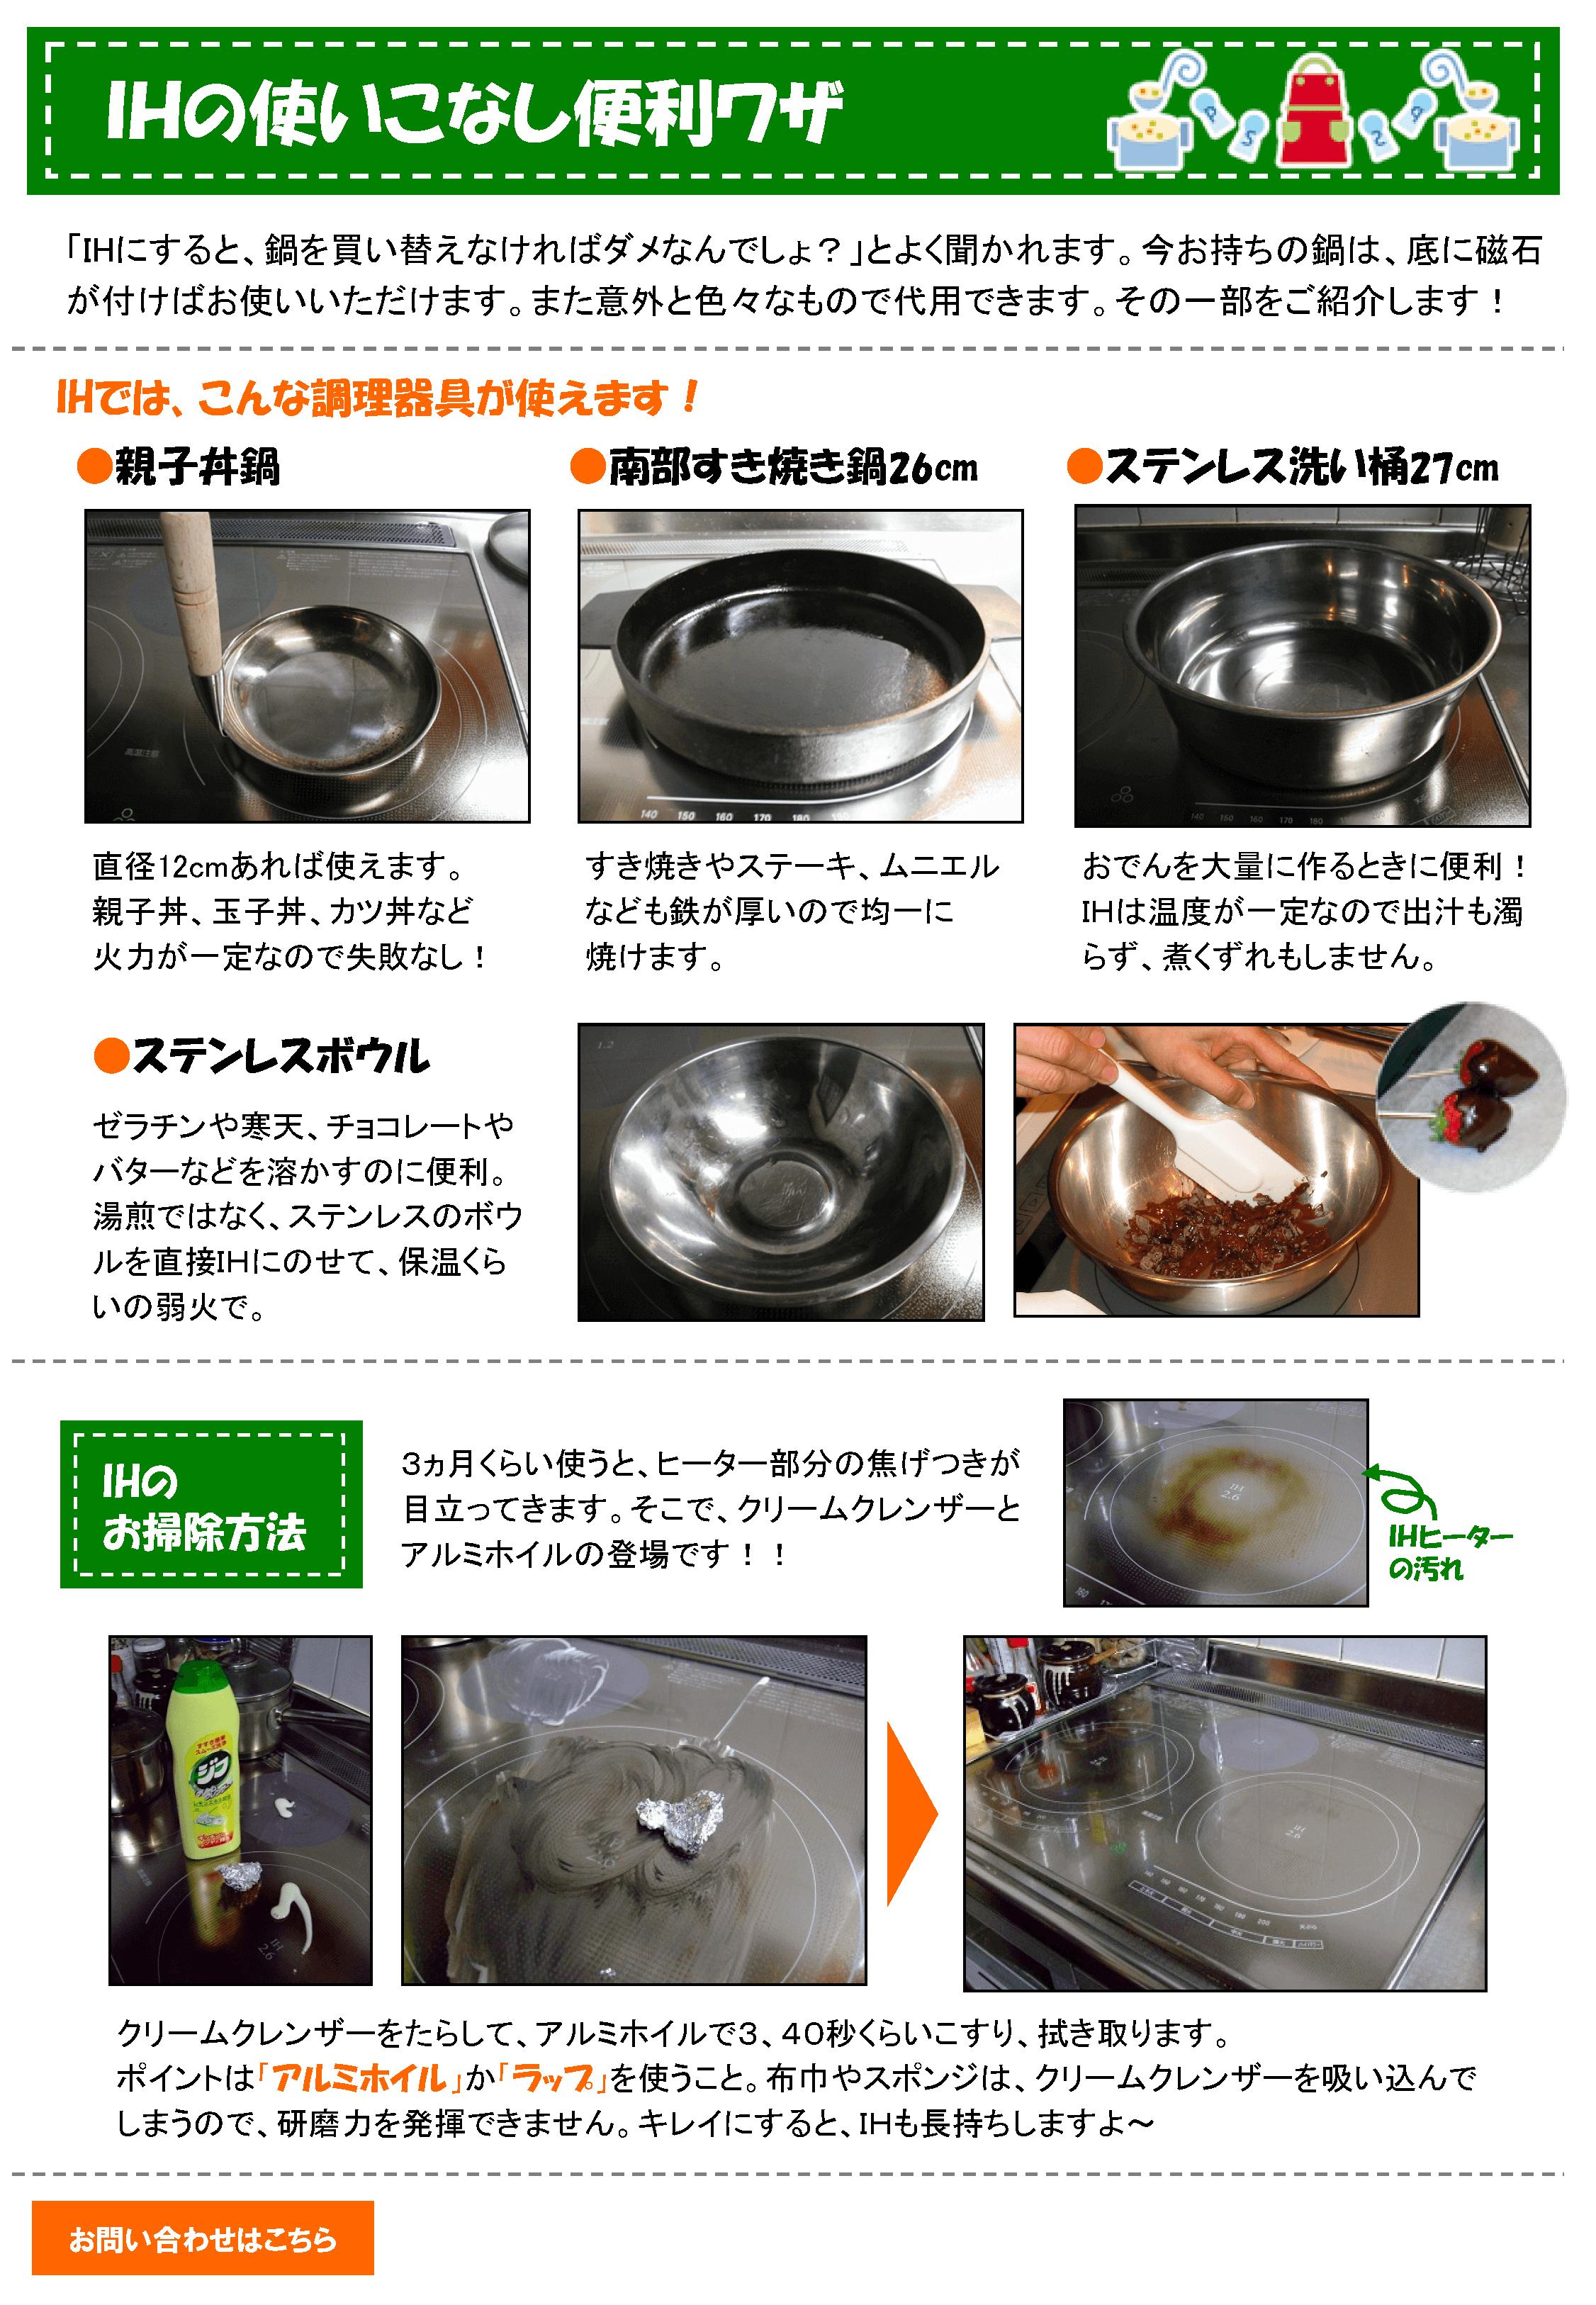 IH対応 お鍋の底の見分け方&お掃除チラシ